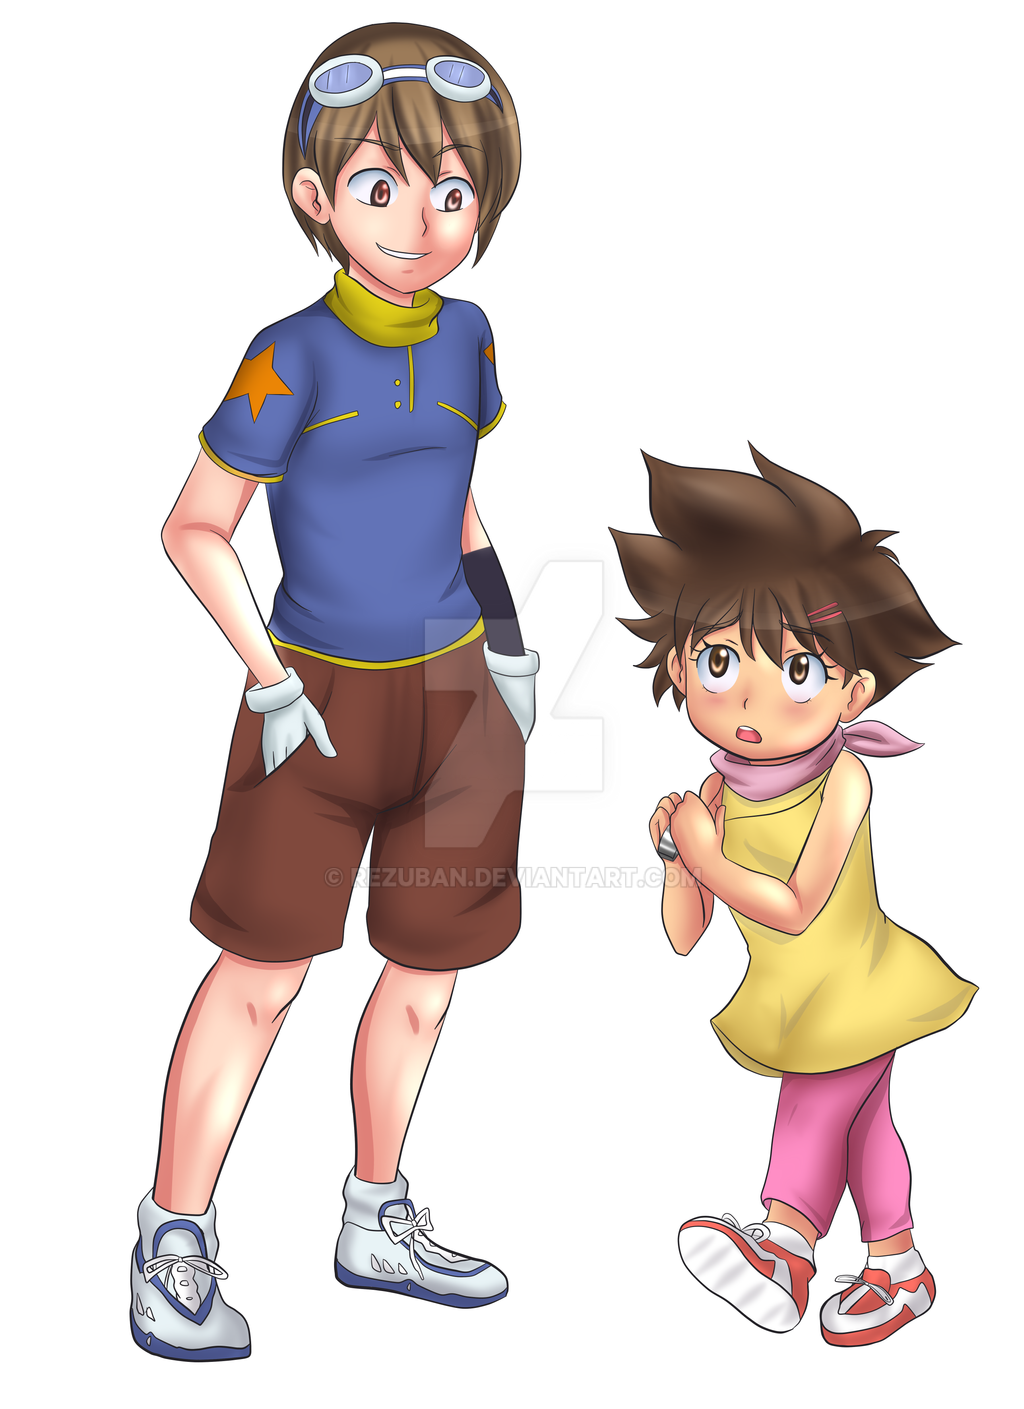 Tai and Kari Digimon TG Ageswap by Rezuban on DeviantArt